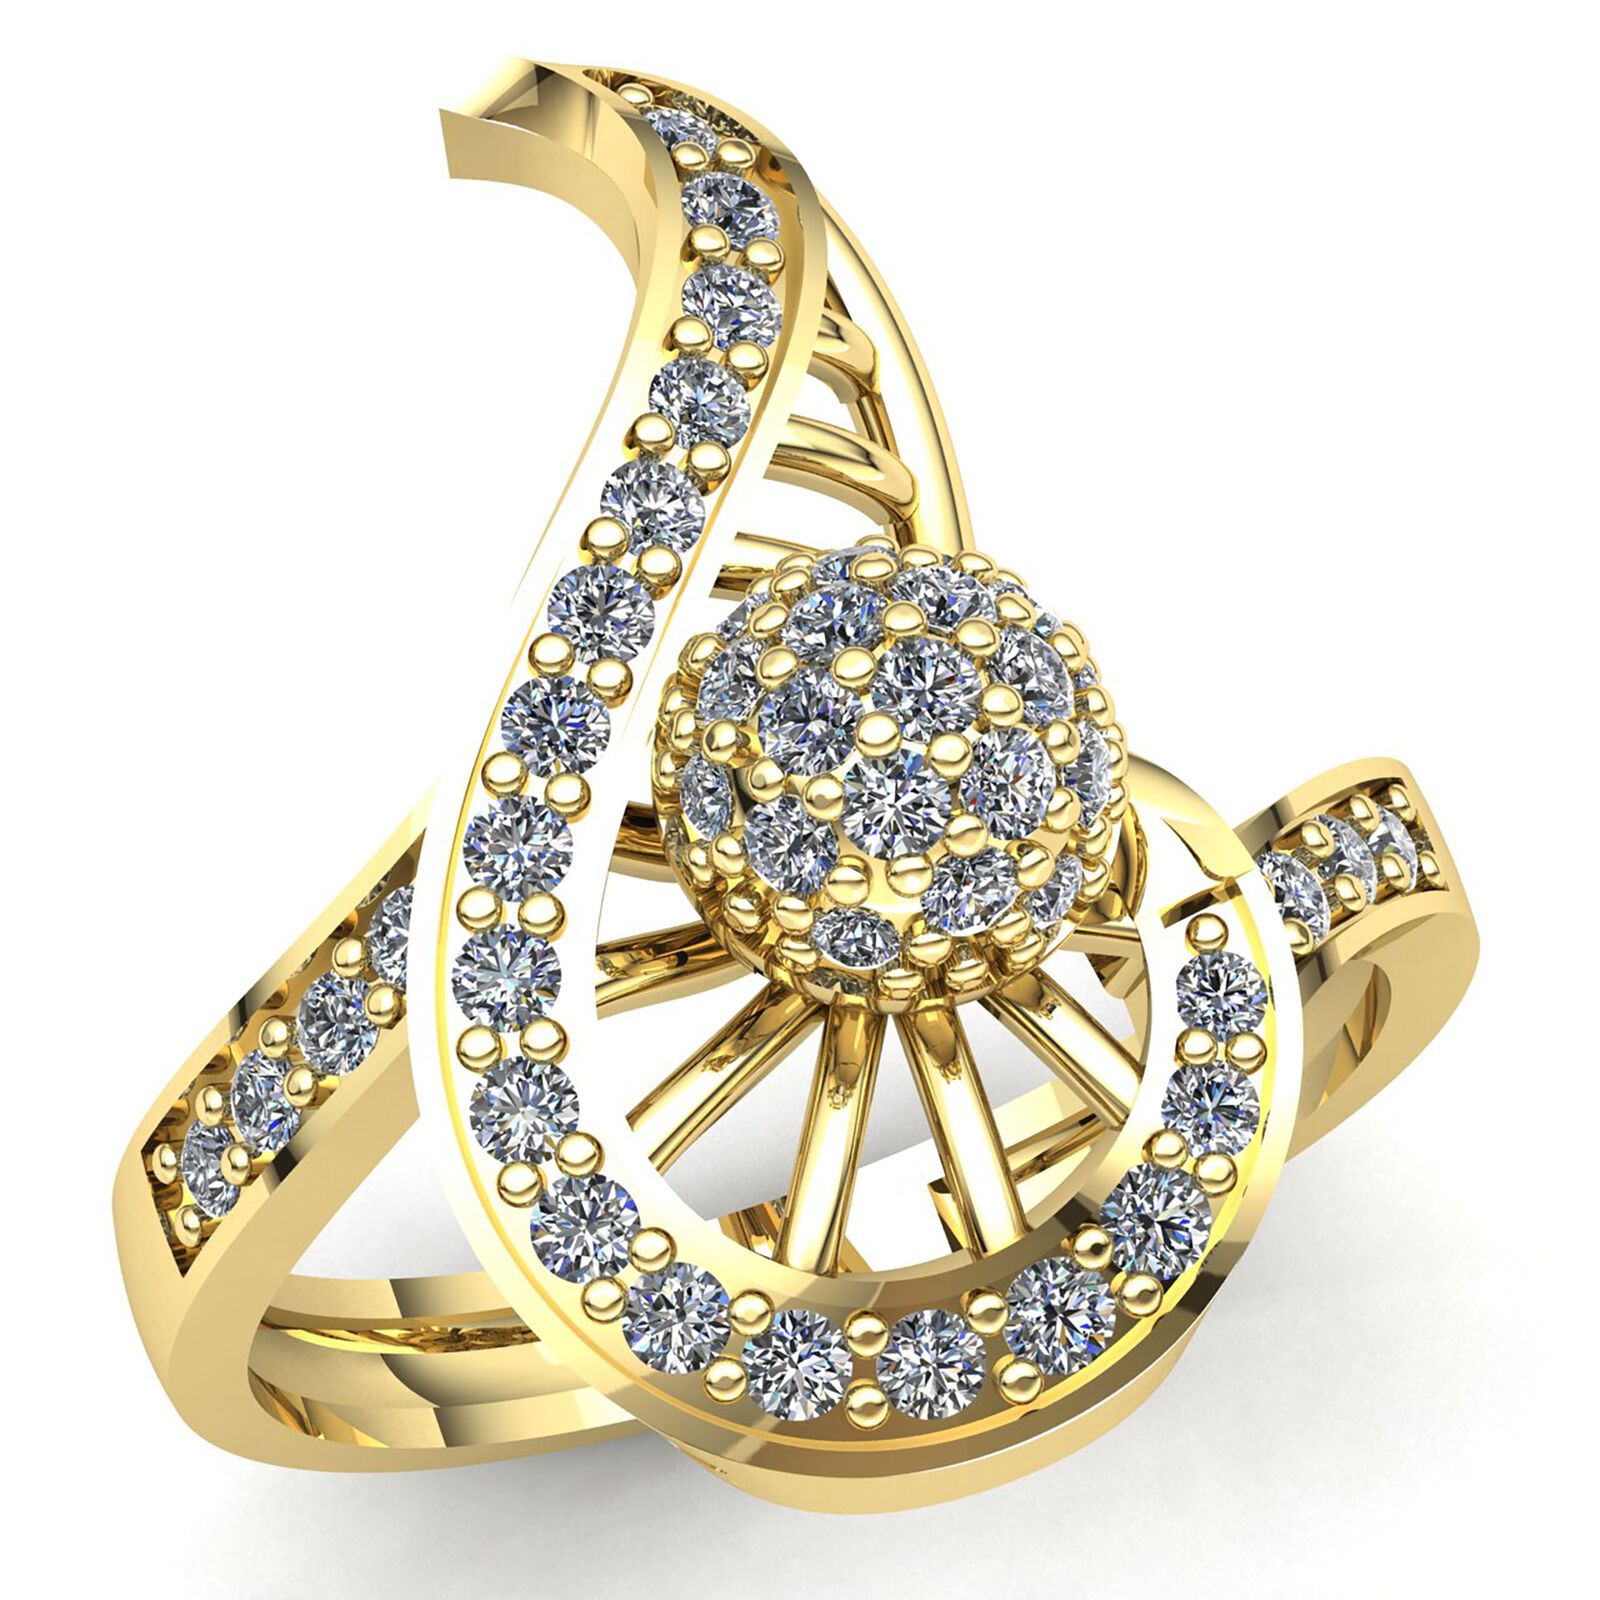 Genuine 0.75ct Round Cut Diamond Ladies Cluster Vintage Engagement Ring 10K gold